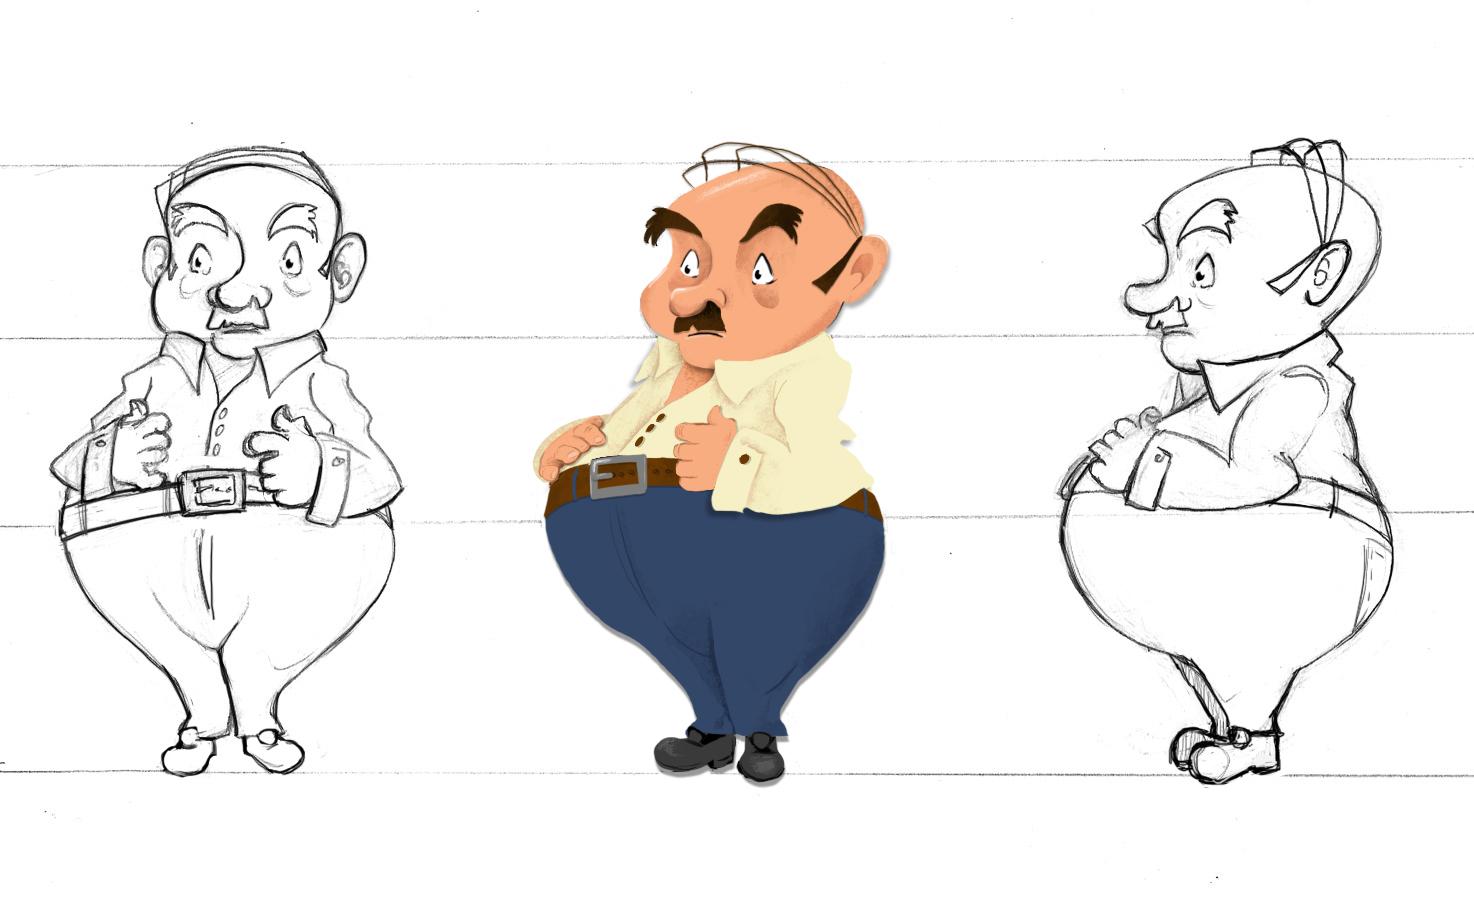 character_design_turnaround_colo